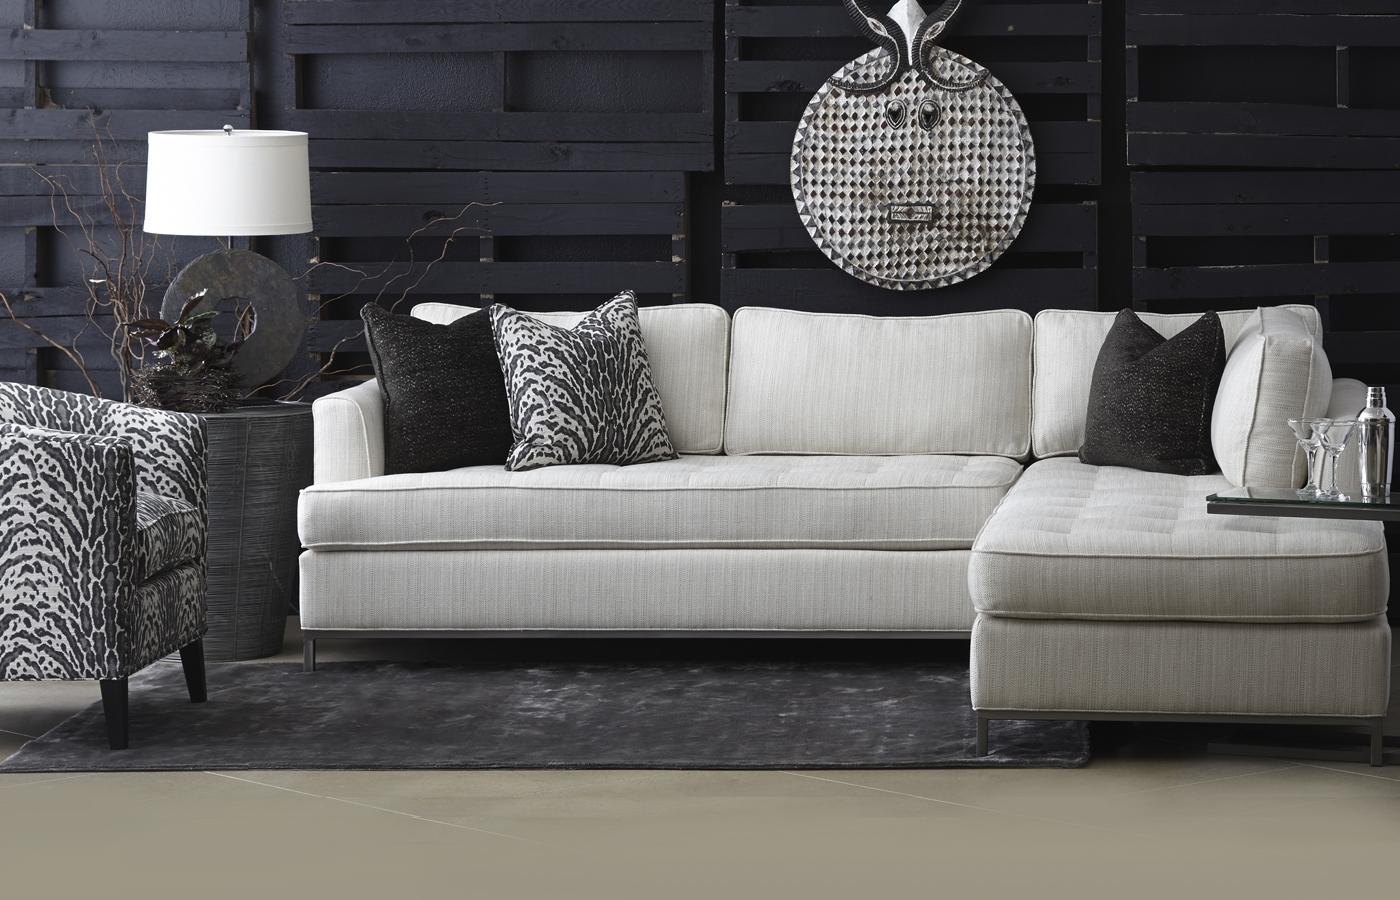 Norwalk Furniture  Tribeca Sectional | Norwalk | Pinterest | Norwalk In Norwalk Sofas (Photo 4 of 10)